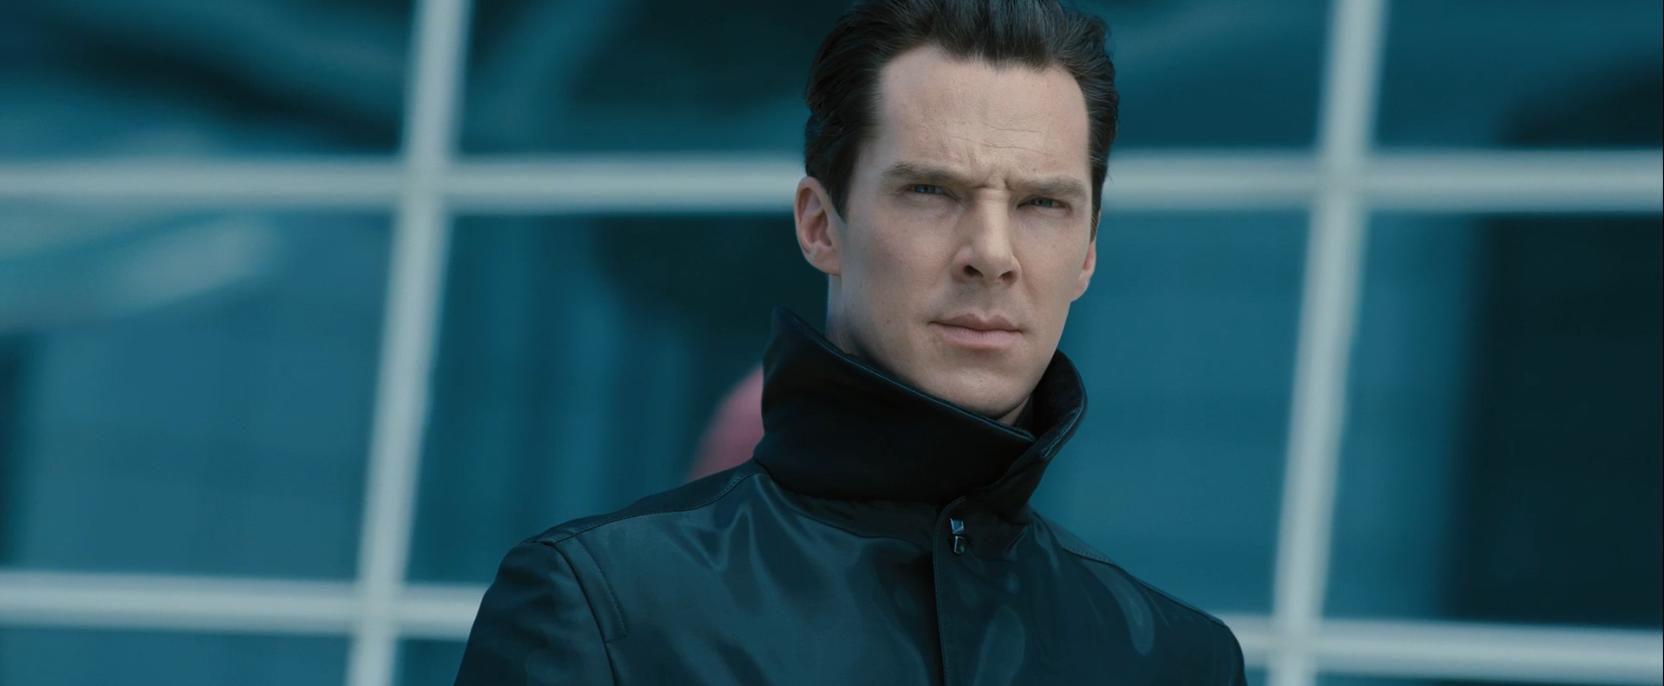 Benedict Cumberbatch as terrorist John Harrison - Star Trek Into Darkness